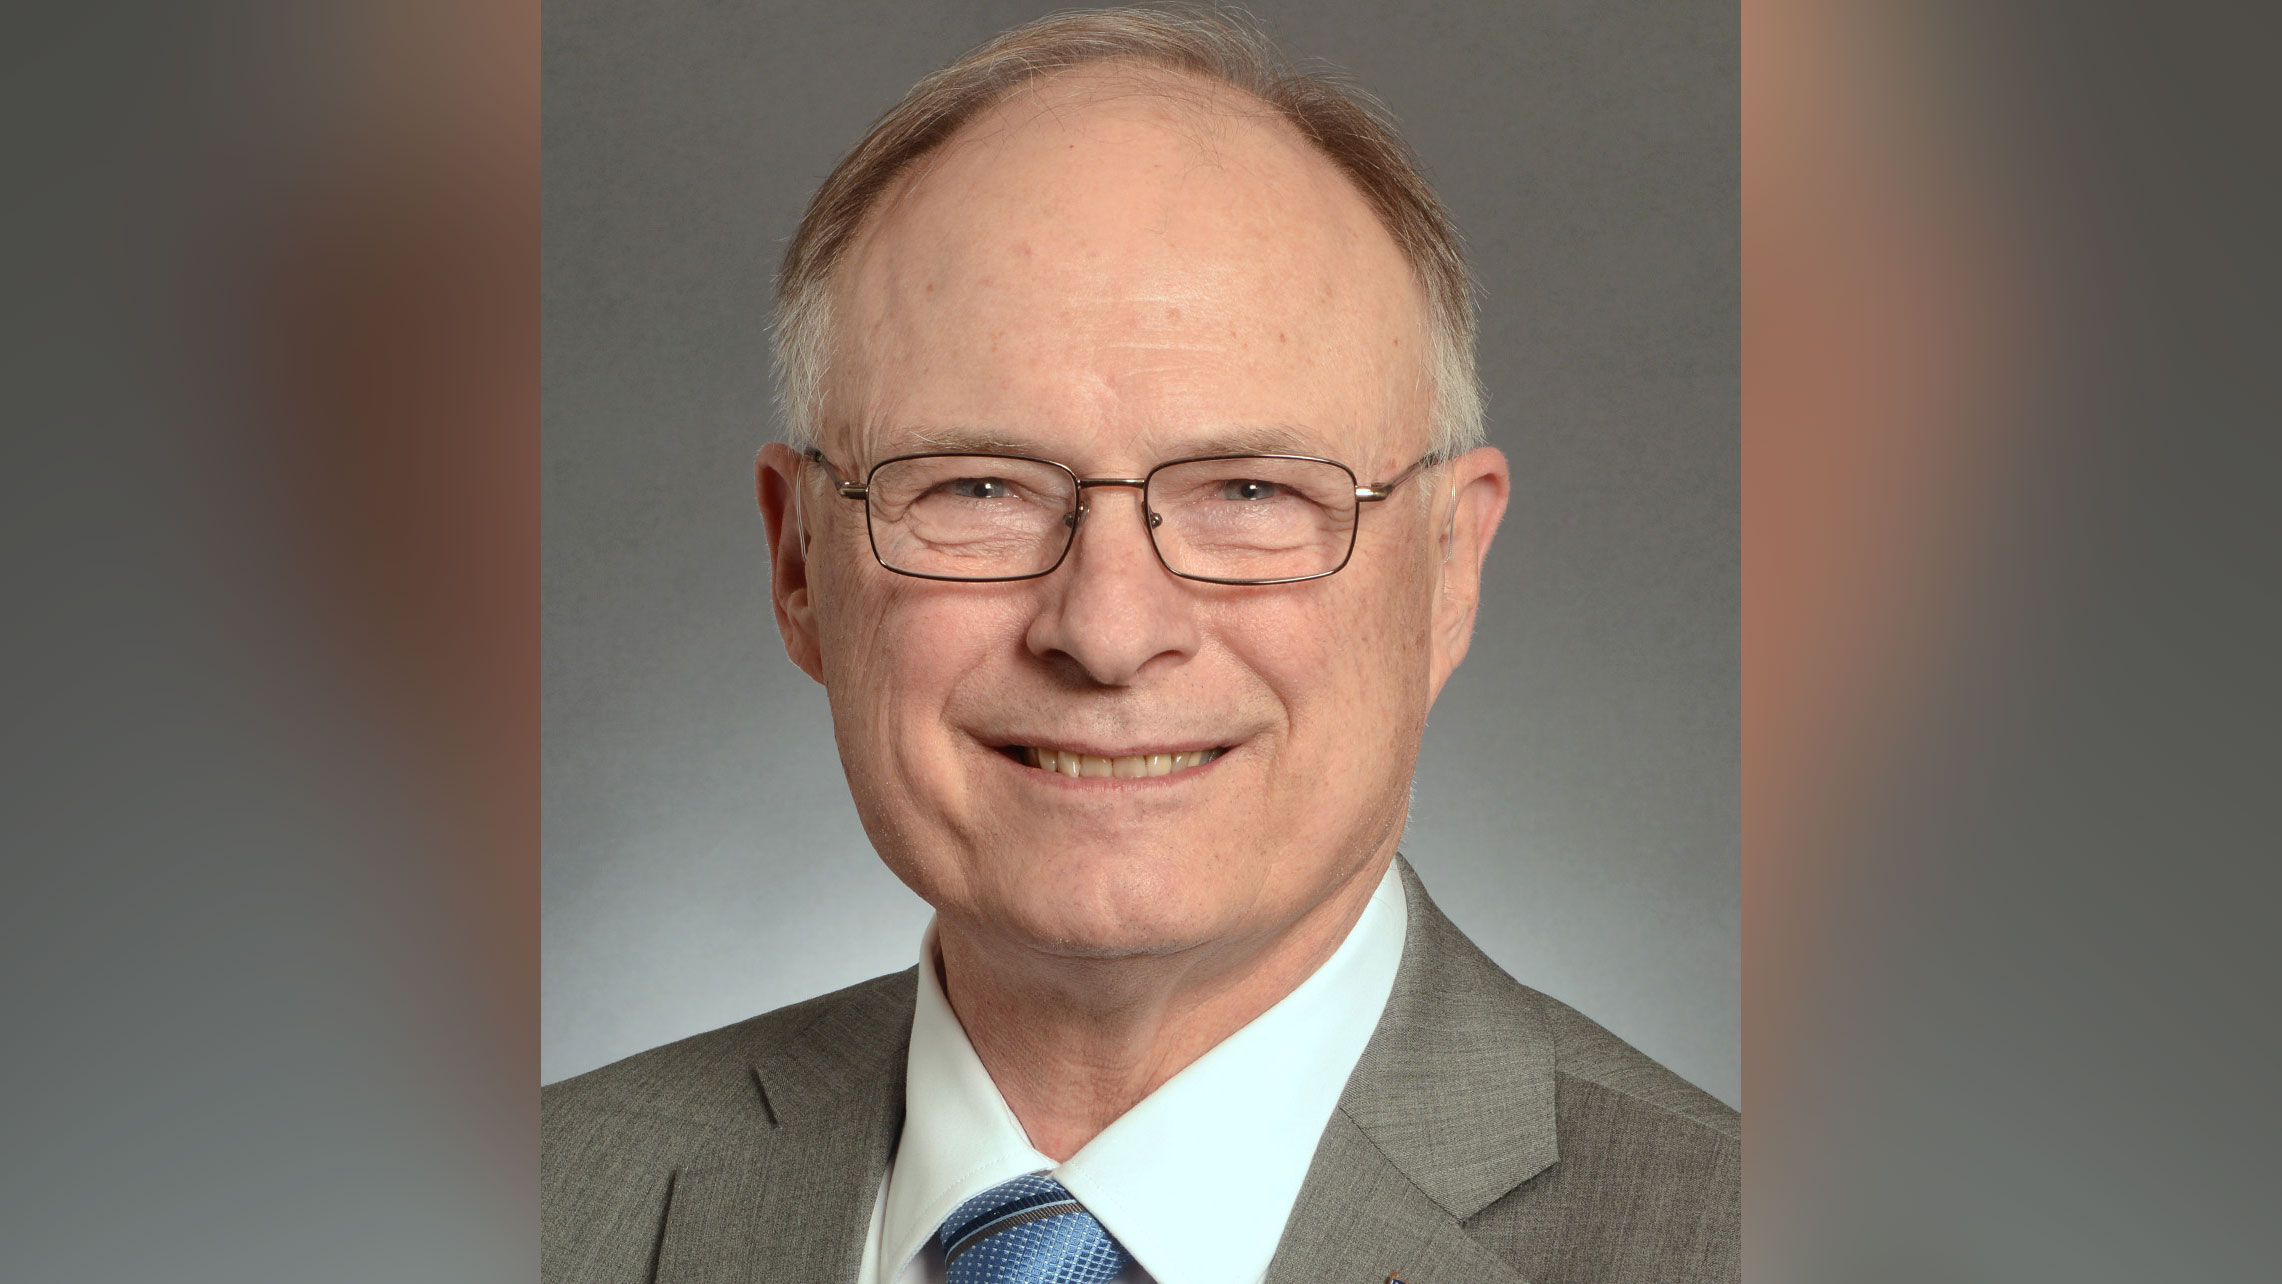 Republican Minnesota State Senator Jerry Relph.